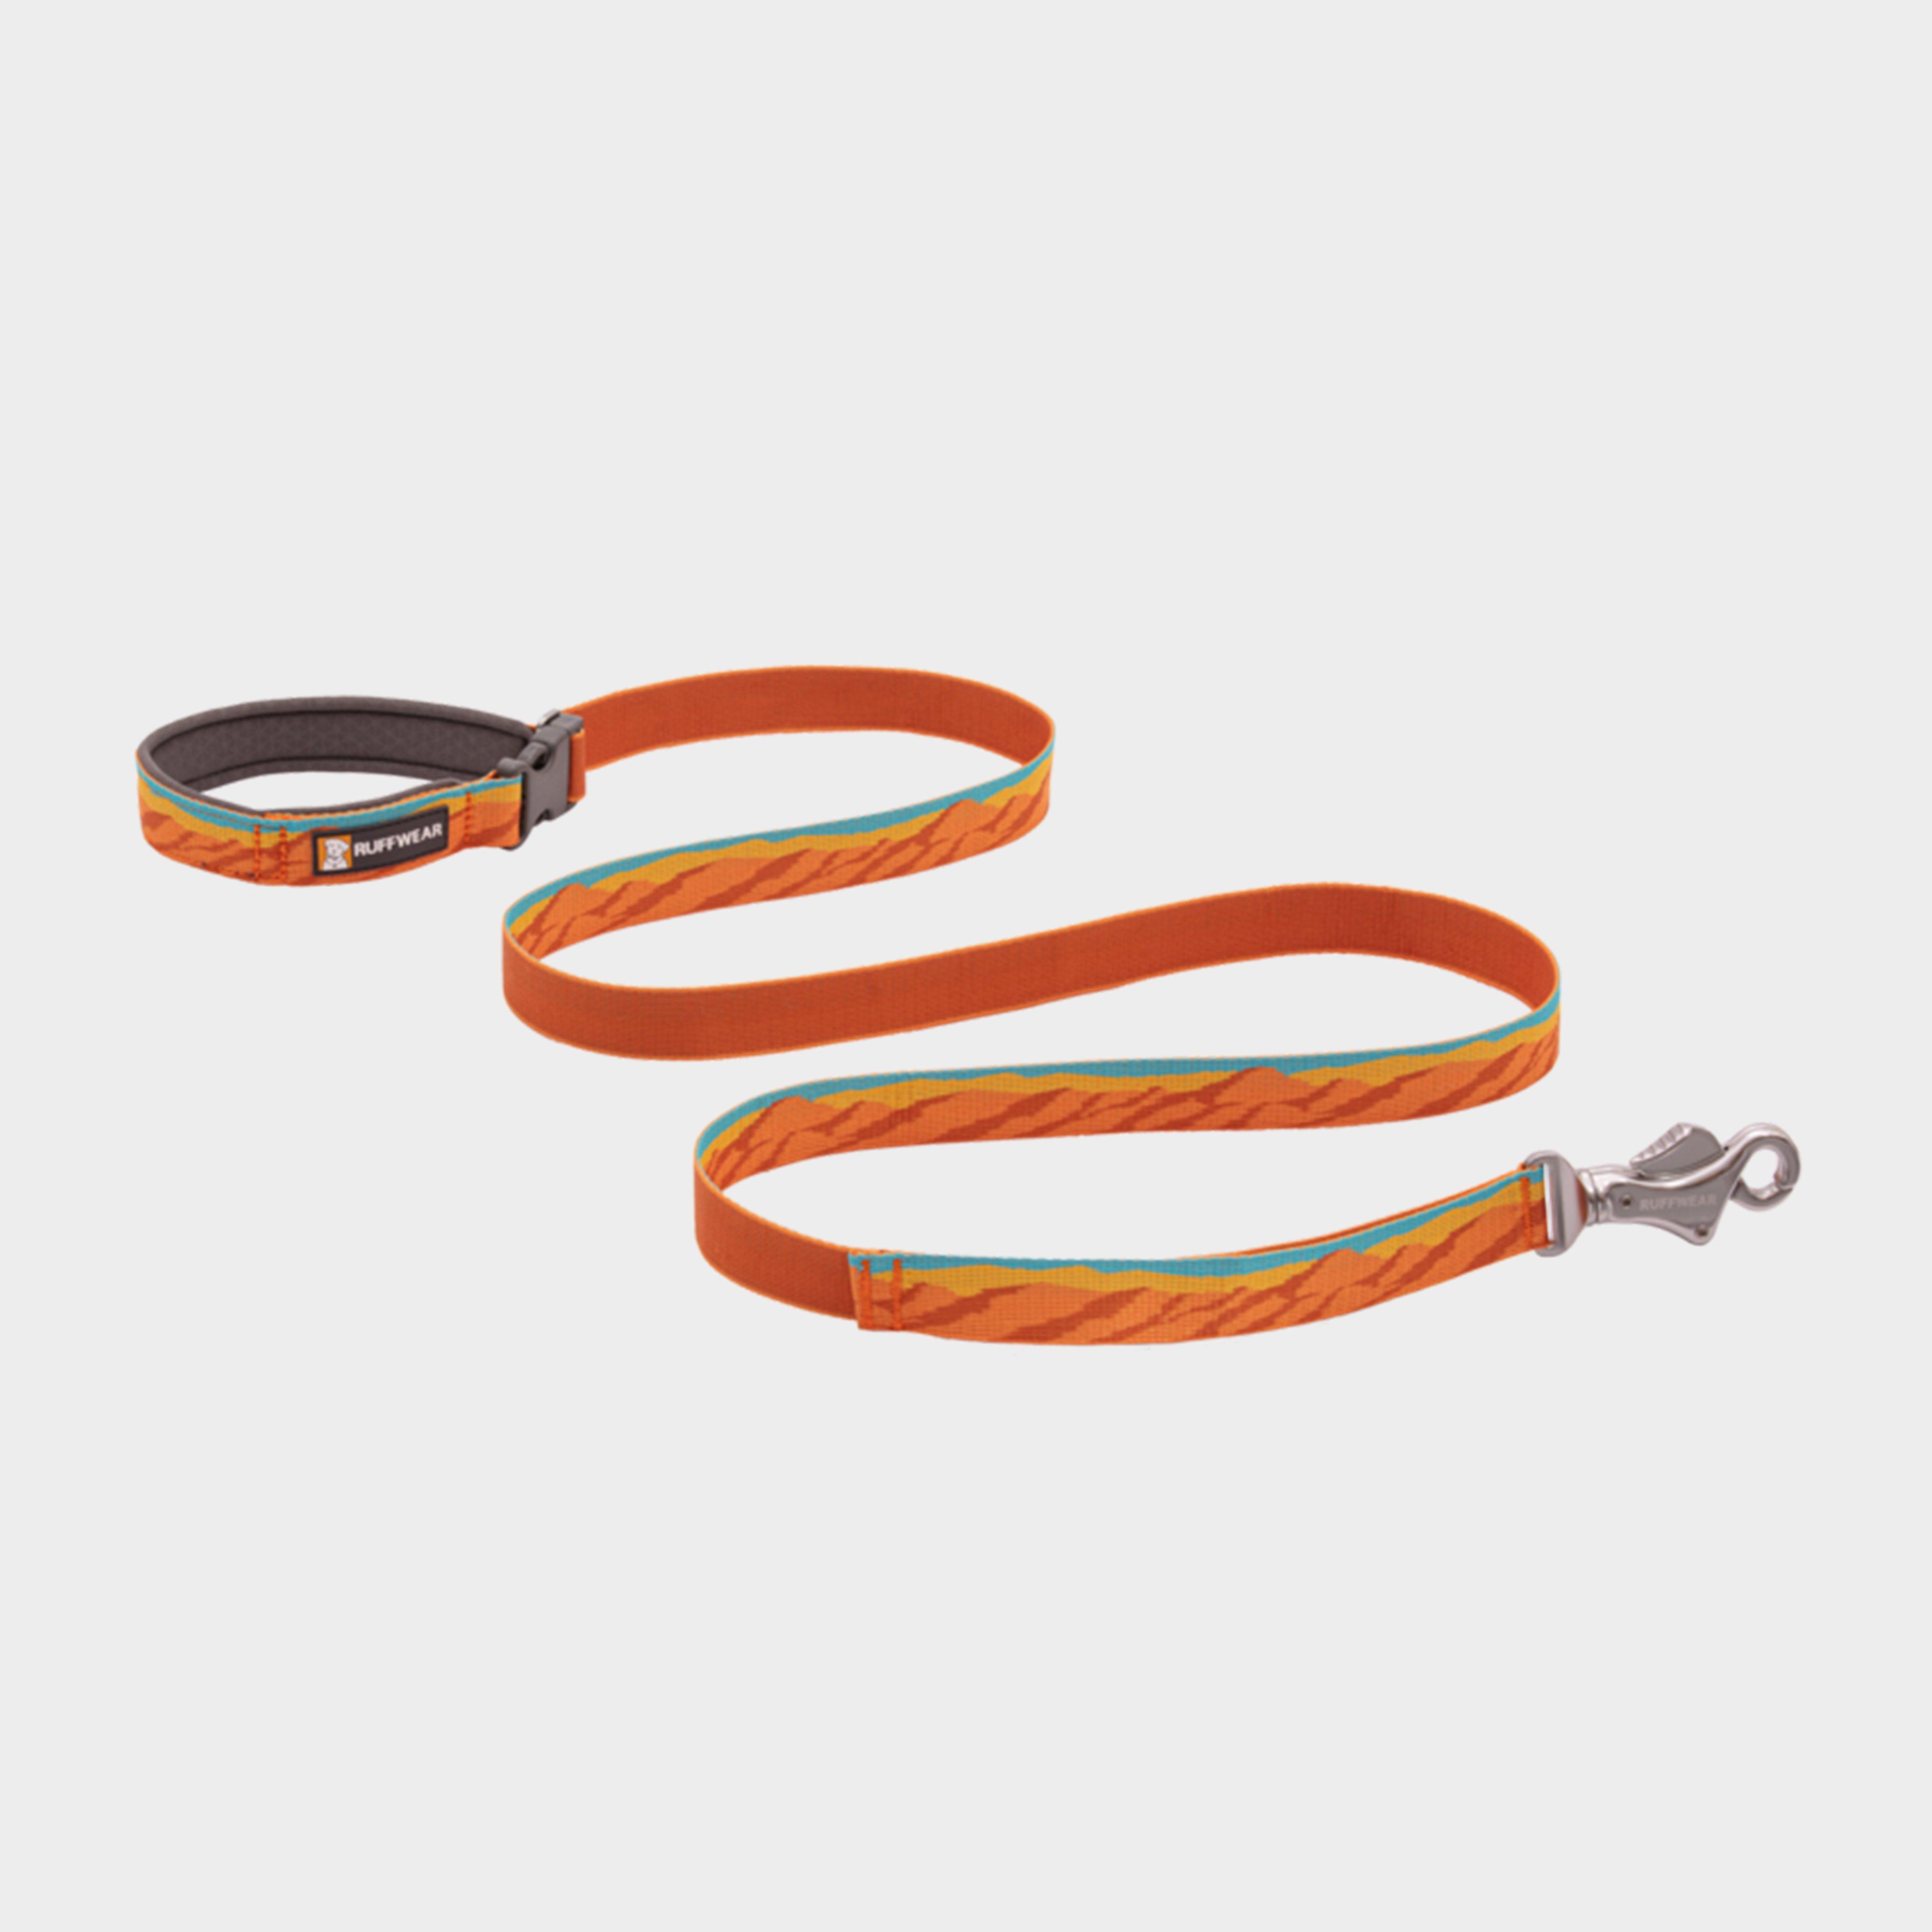 Image of Ruffwear Flat Out Adjustable Dog Lead - Orange/Fall, Orange/FALL